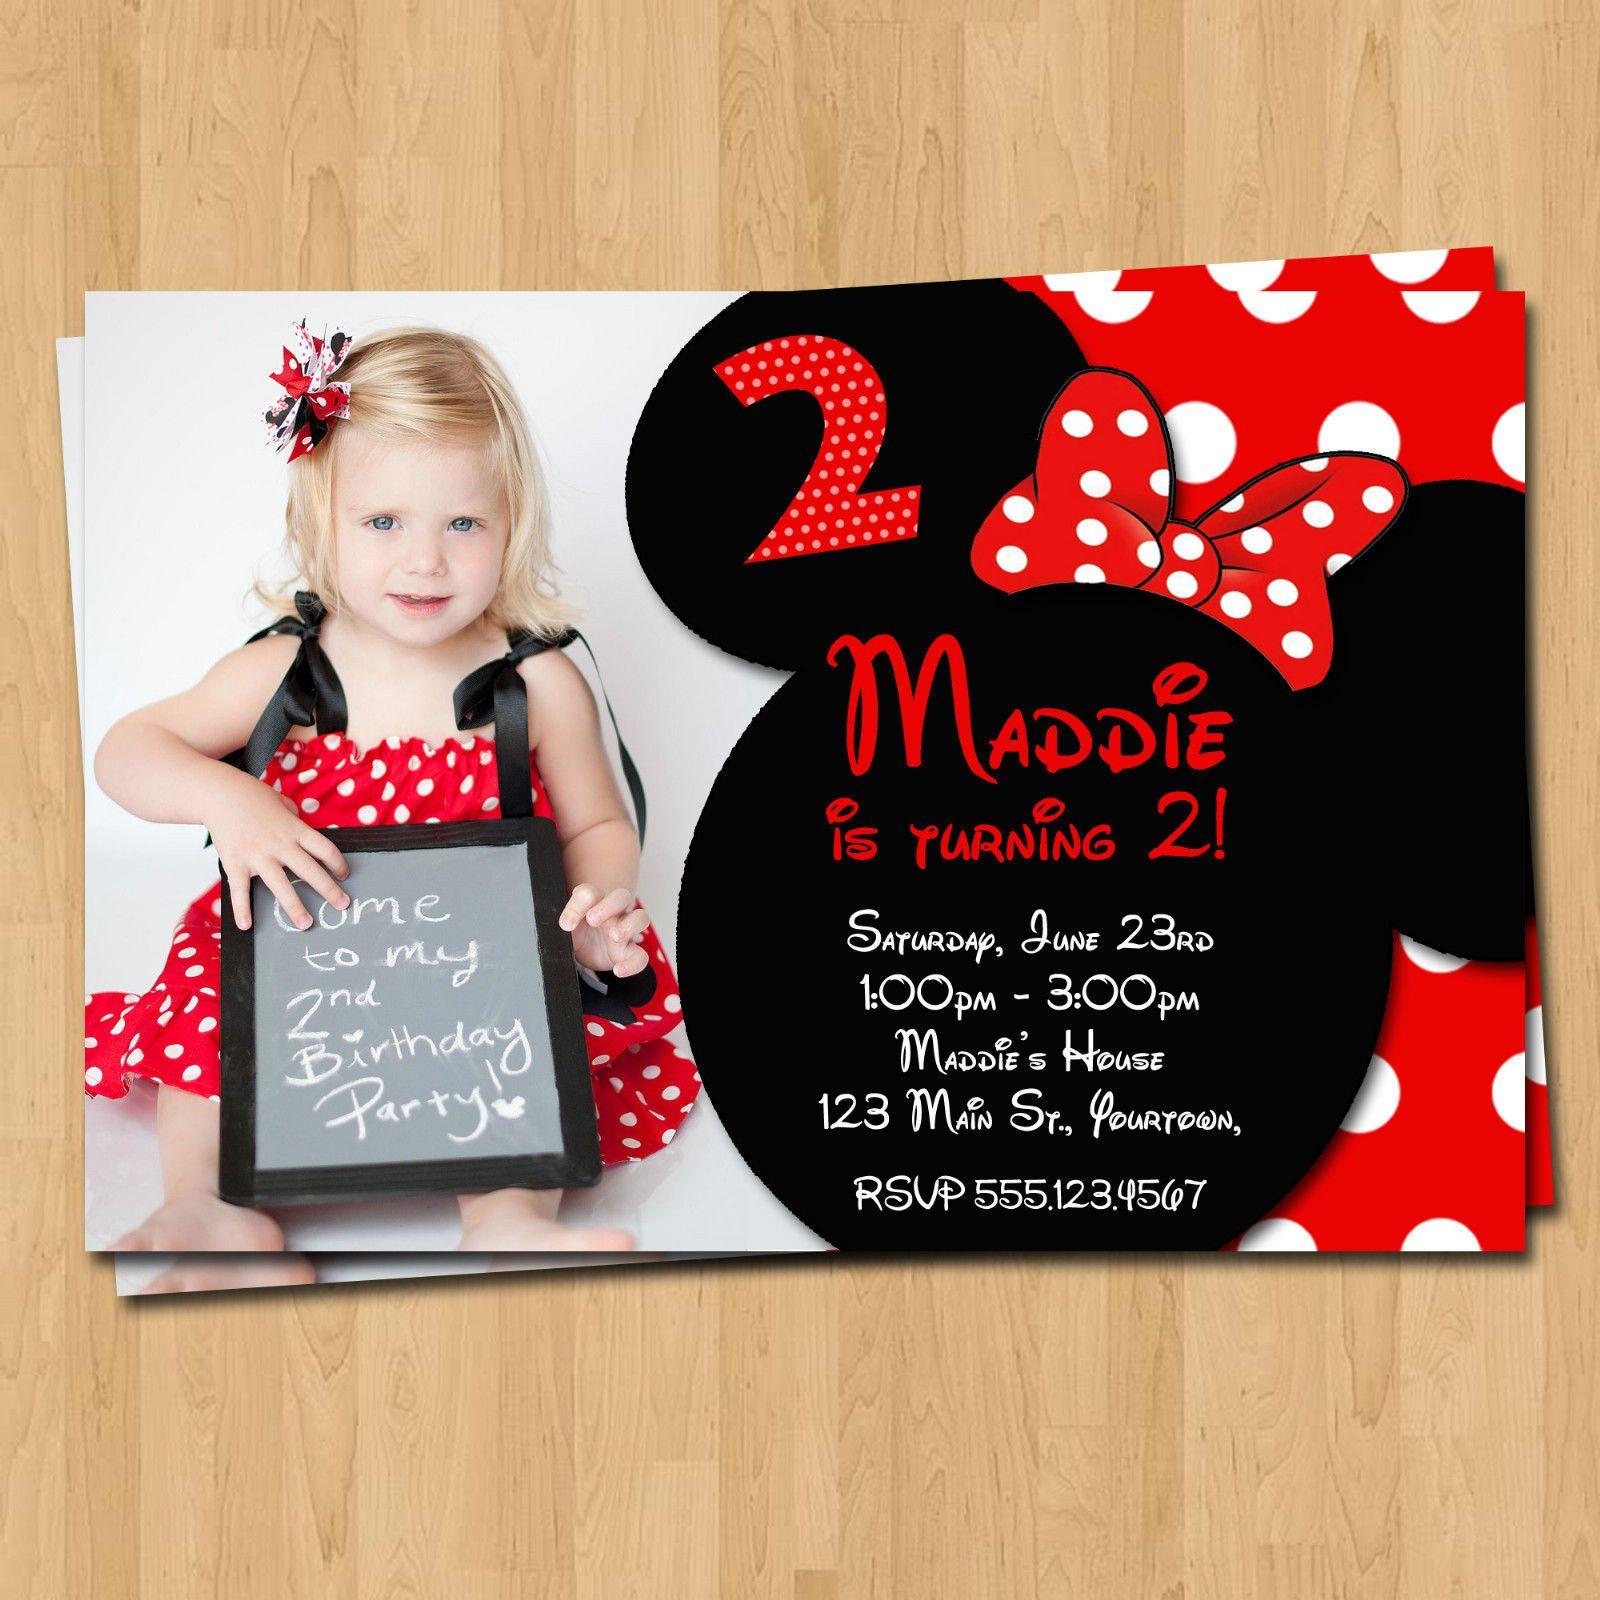 Free Printable Minnie Mouse Birthday Party Invitations | Minnie ...